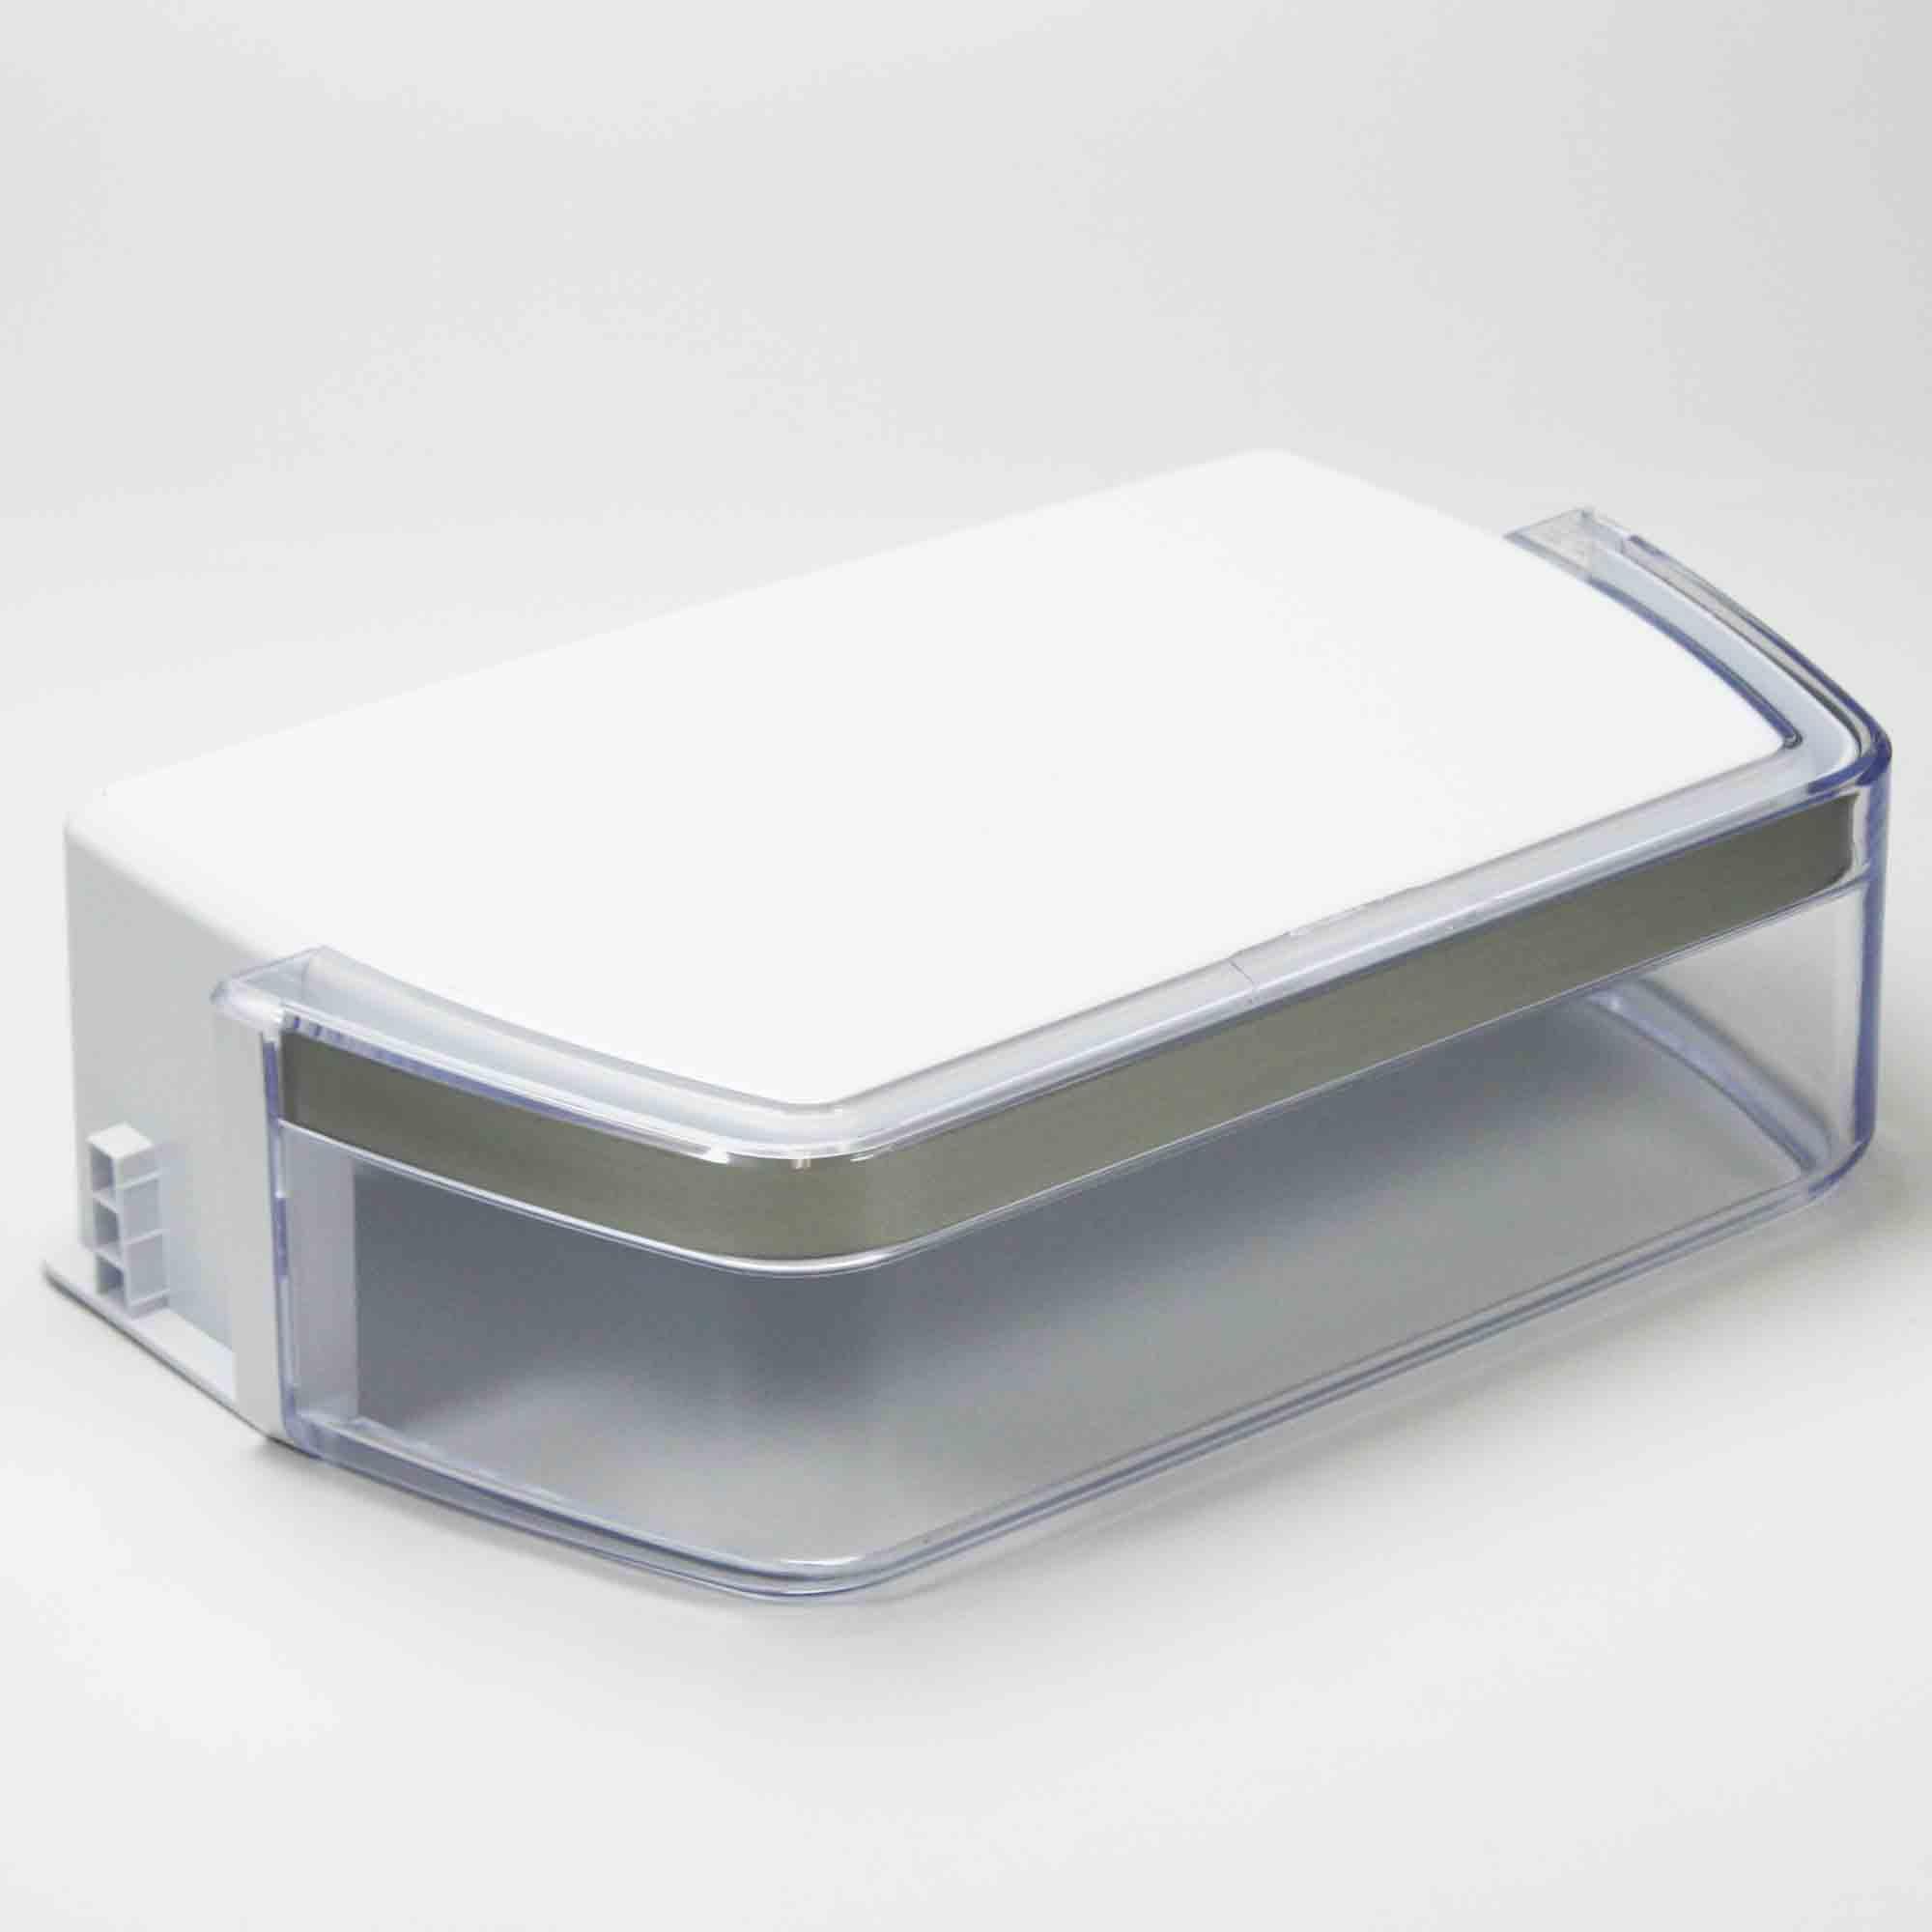 da97 08406a samsung refrigerator door shelf ebay. Black Bedroom Furniture Sets. Home Design Ideas